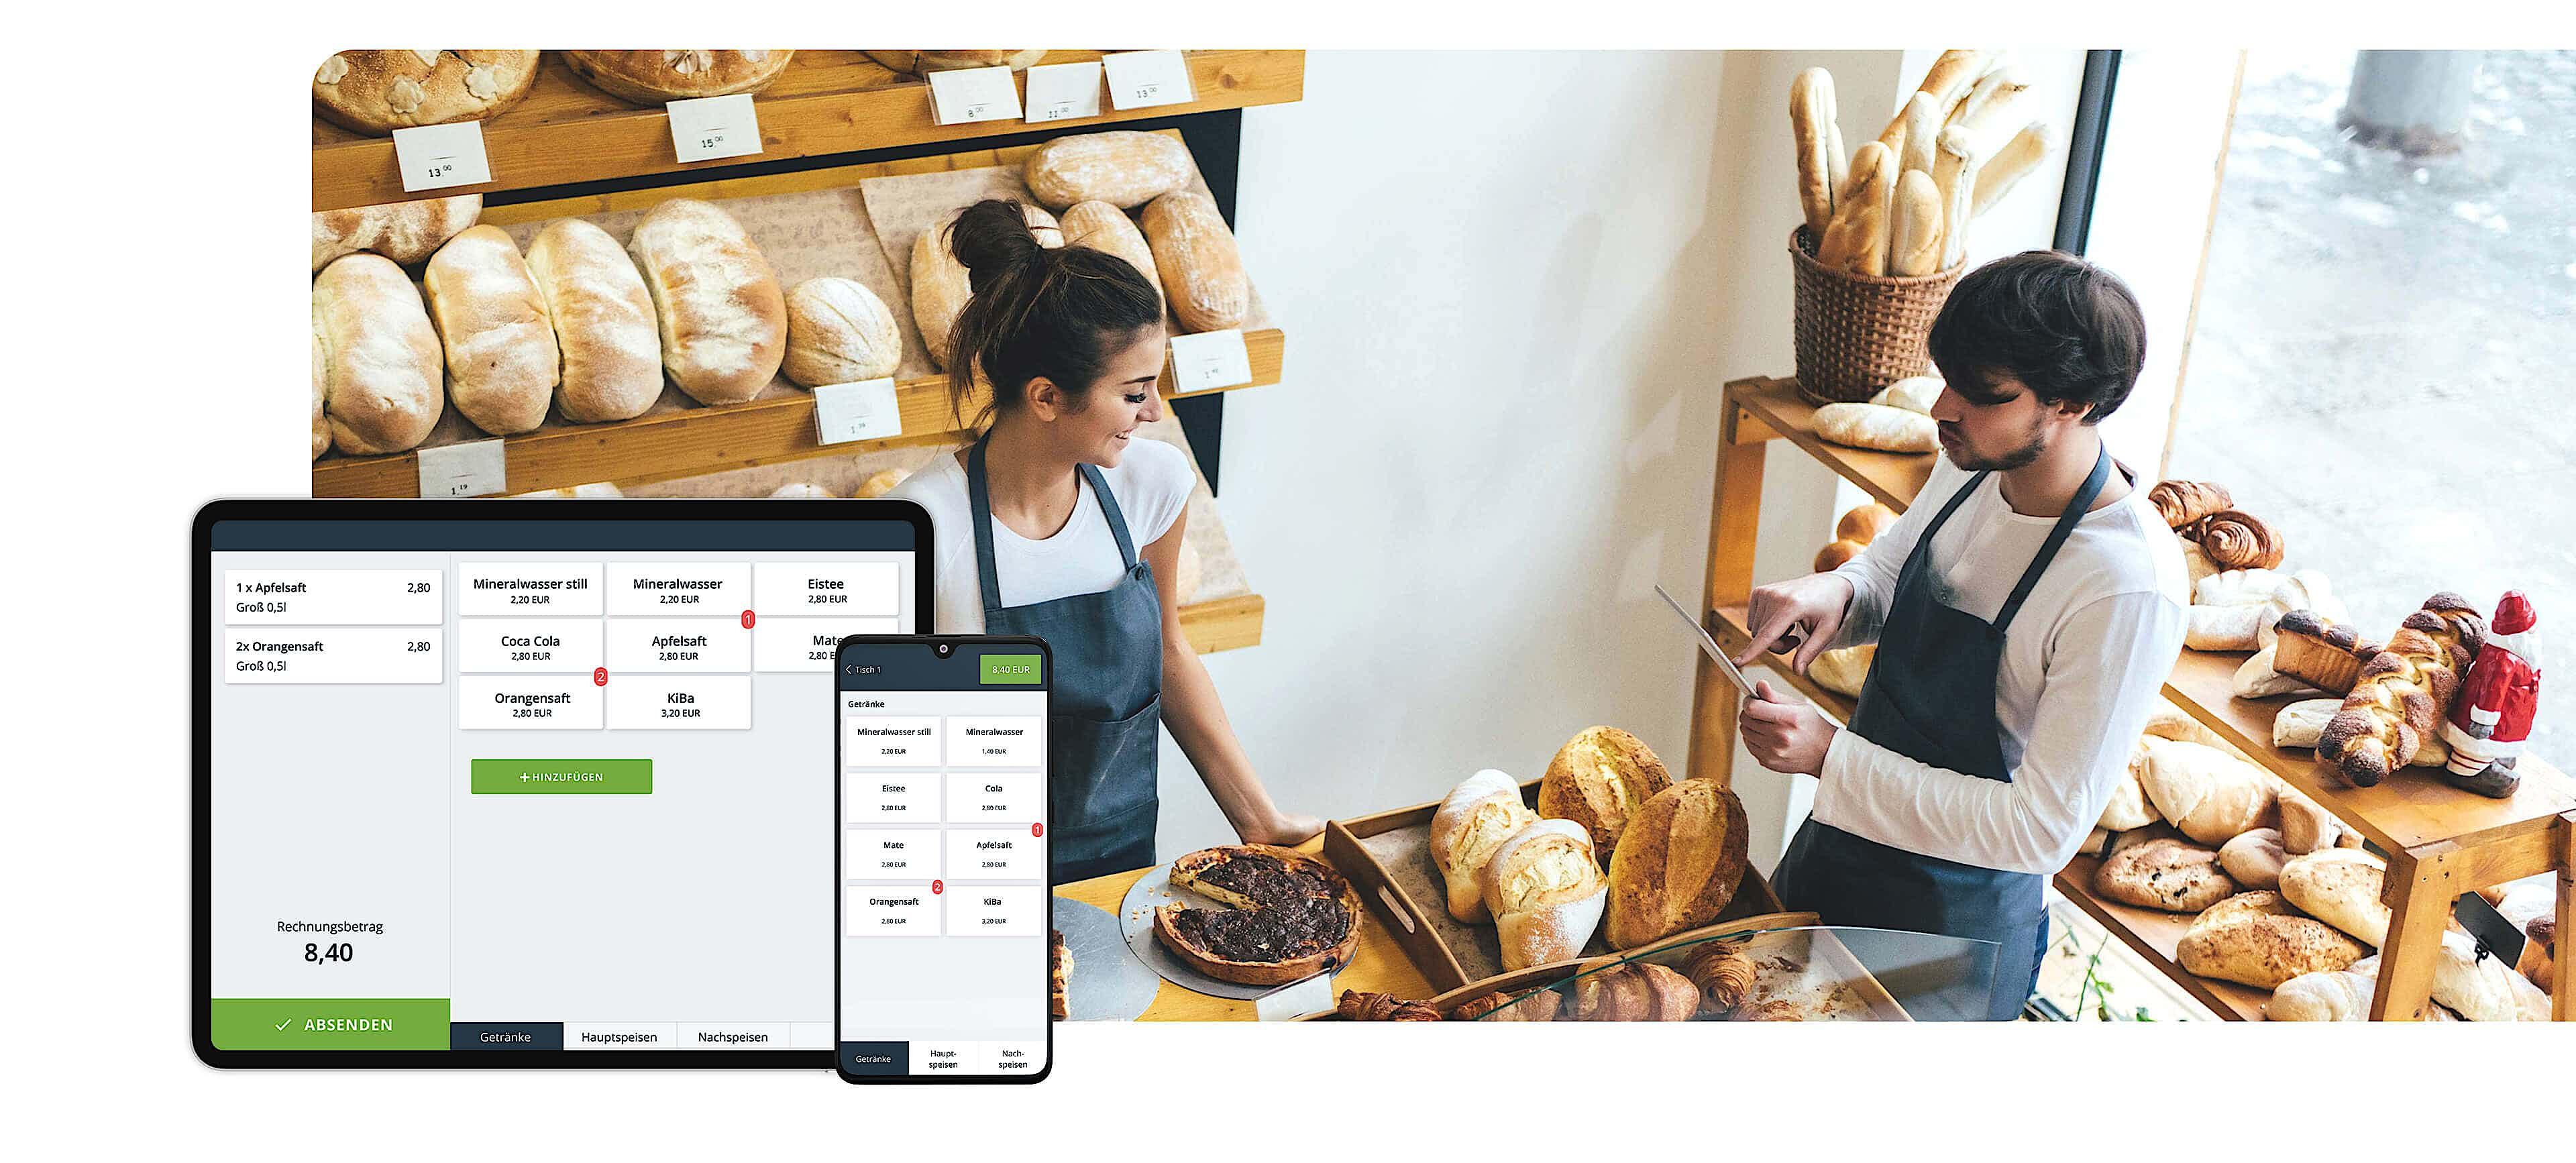 Ipad-Handy-Gerät-Software-Bäckerei